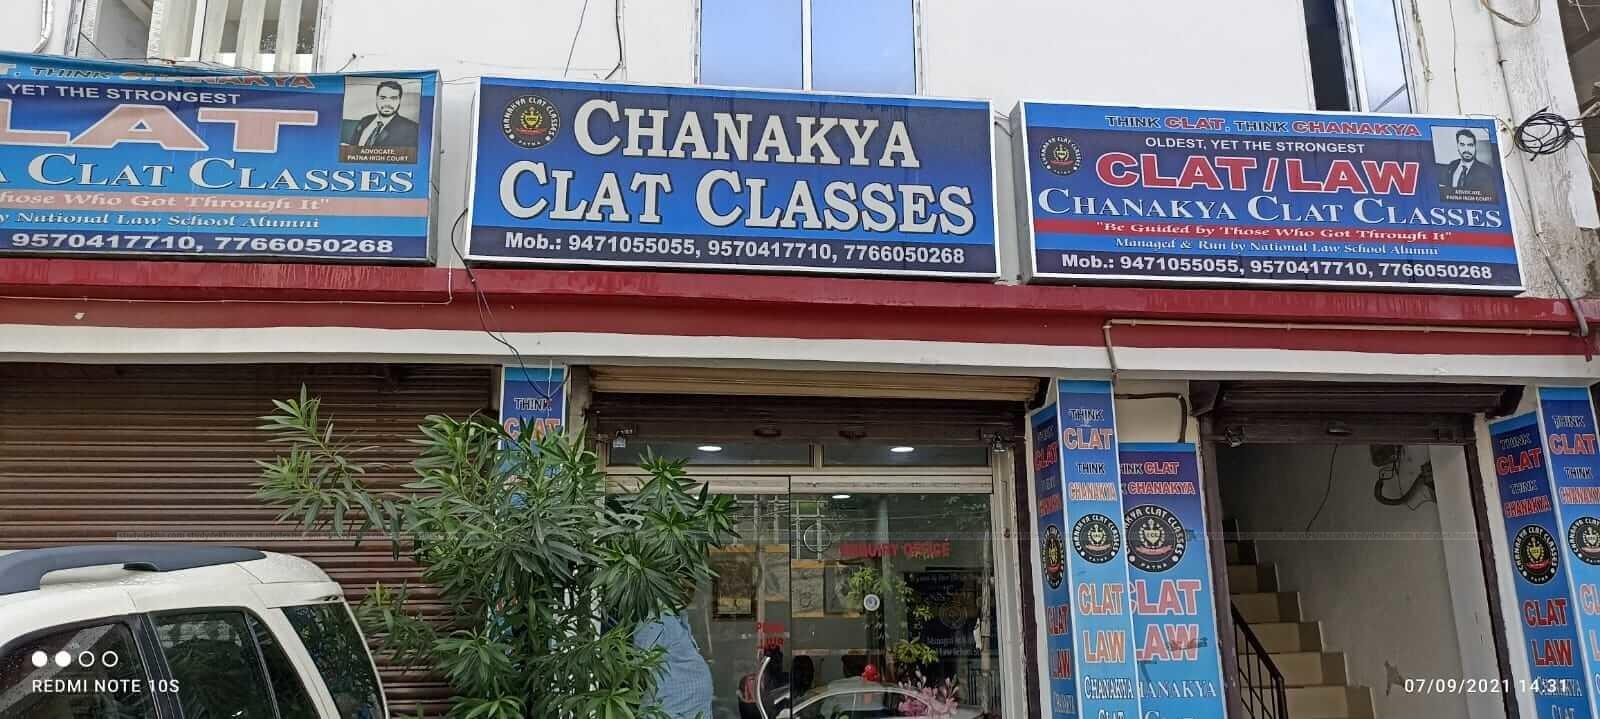 Chanakya Clat Classes Gallery